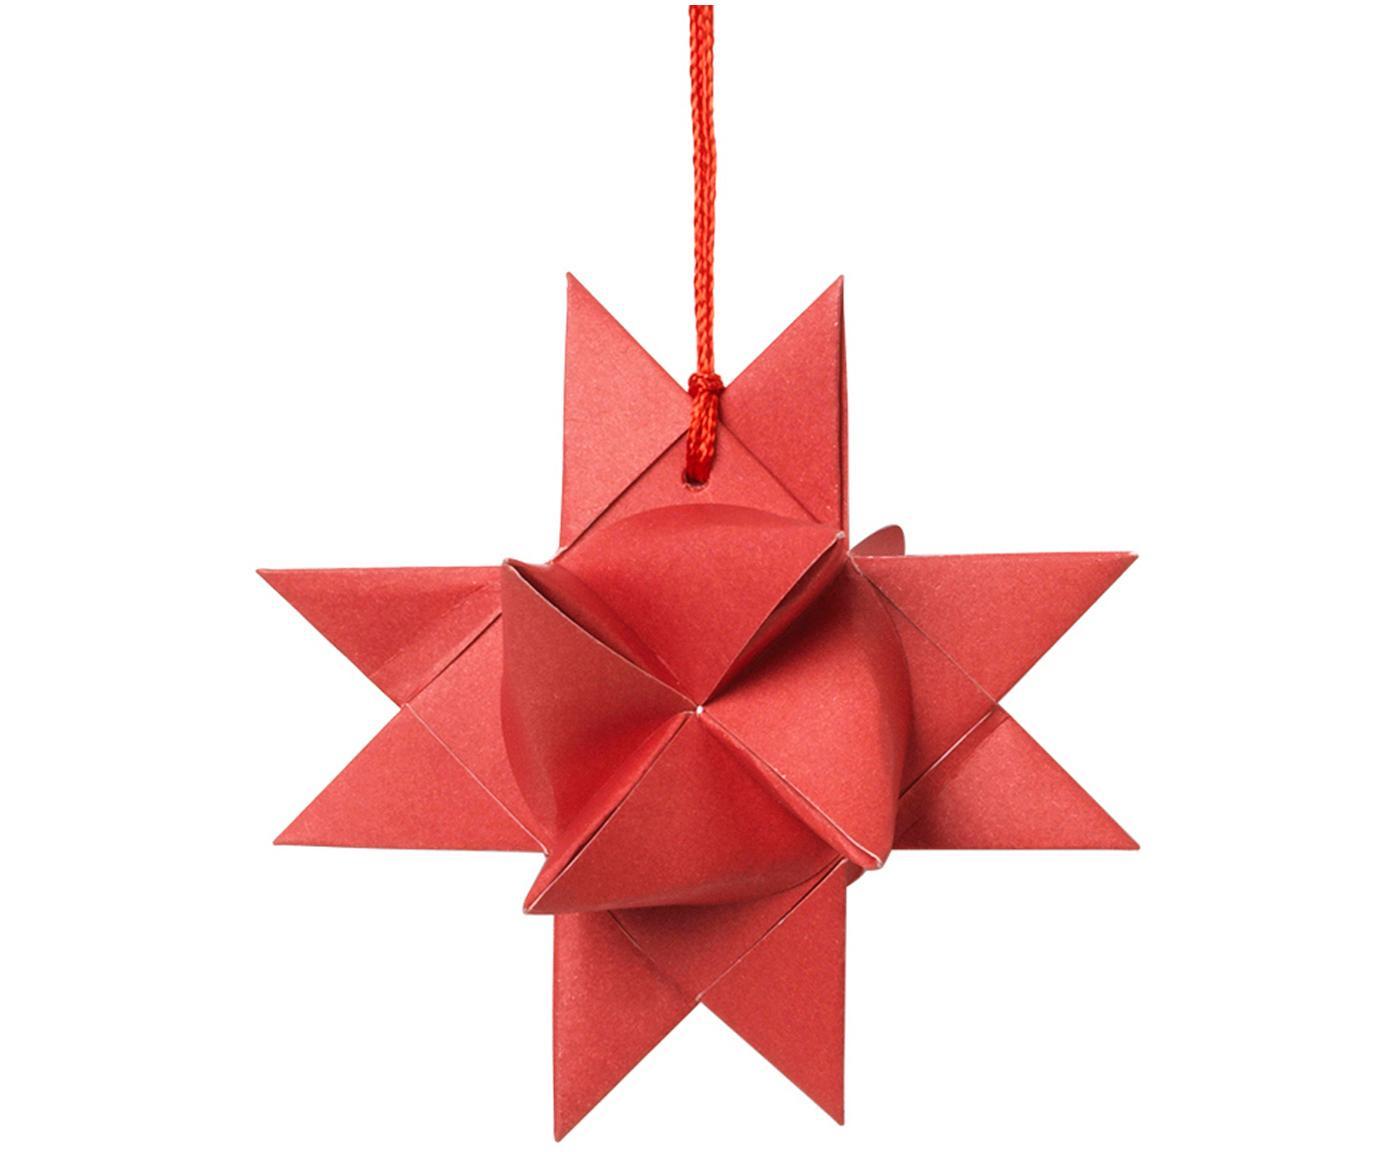 Ciondolo Star Origami 4 pz, Carta, Rosso, Larg. 11 x Prof. 11 cm